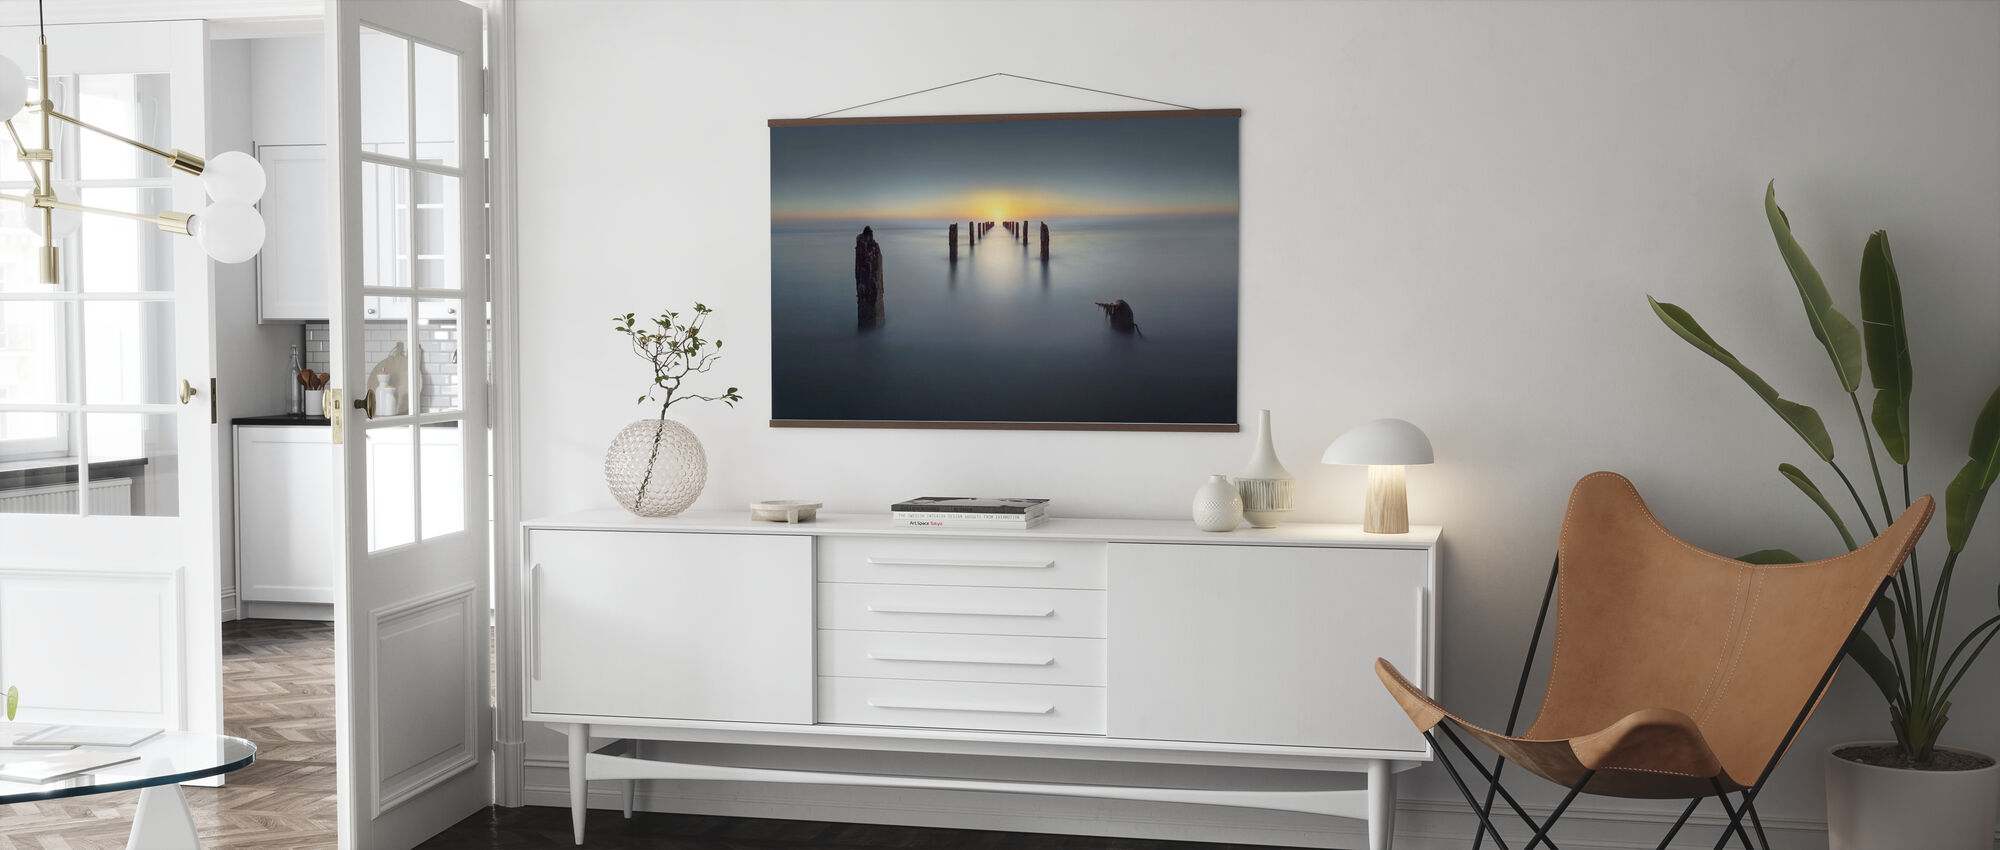 Last Light - Poster - Living Room